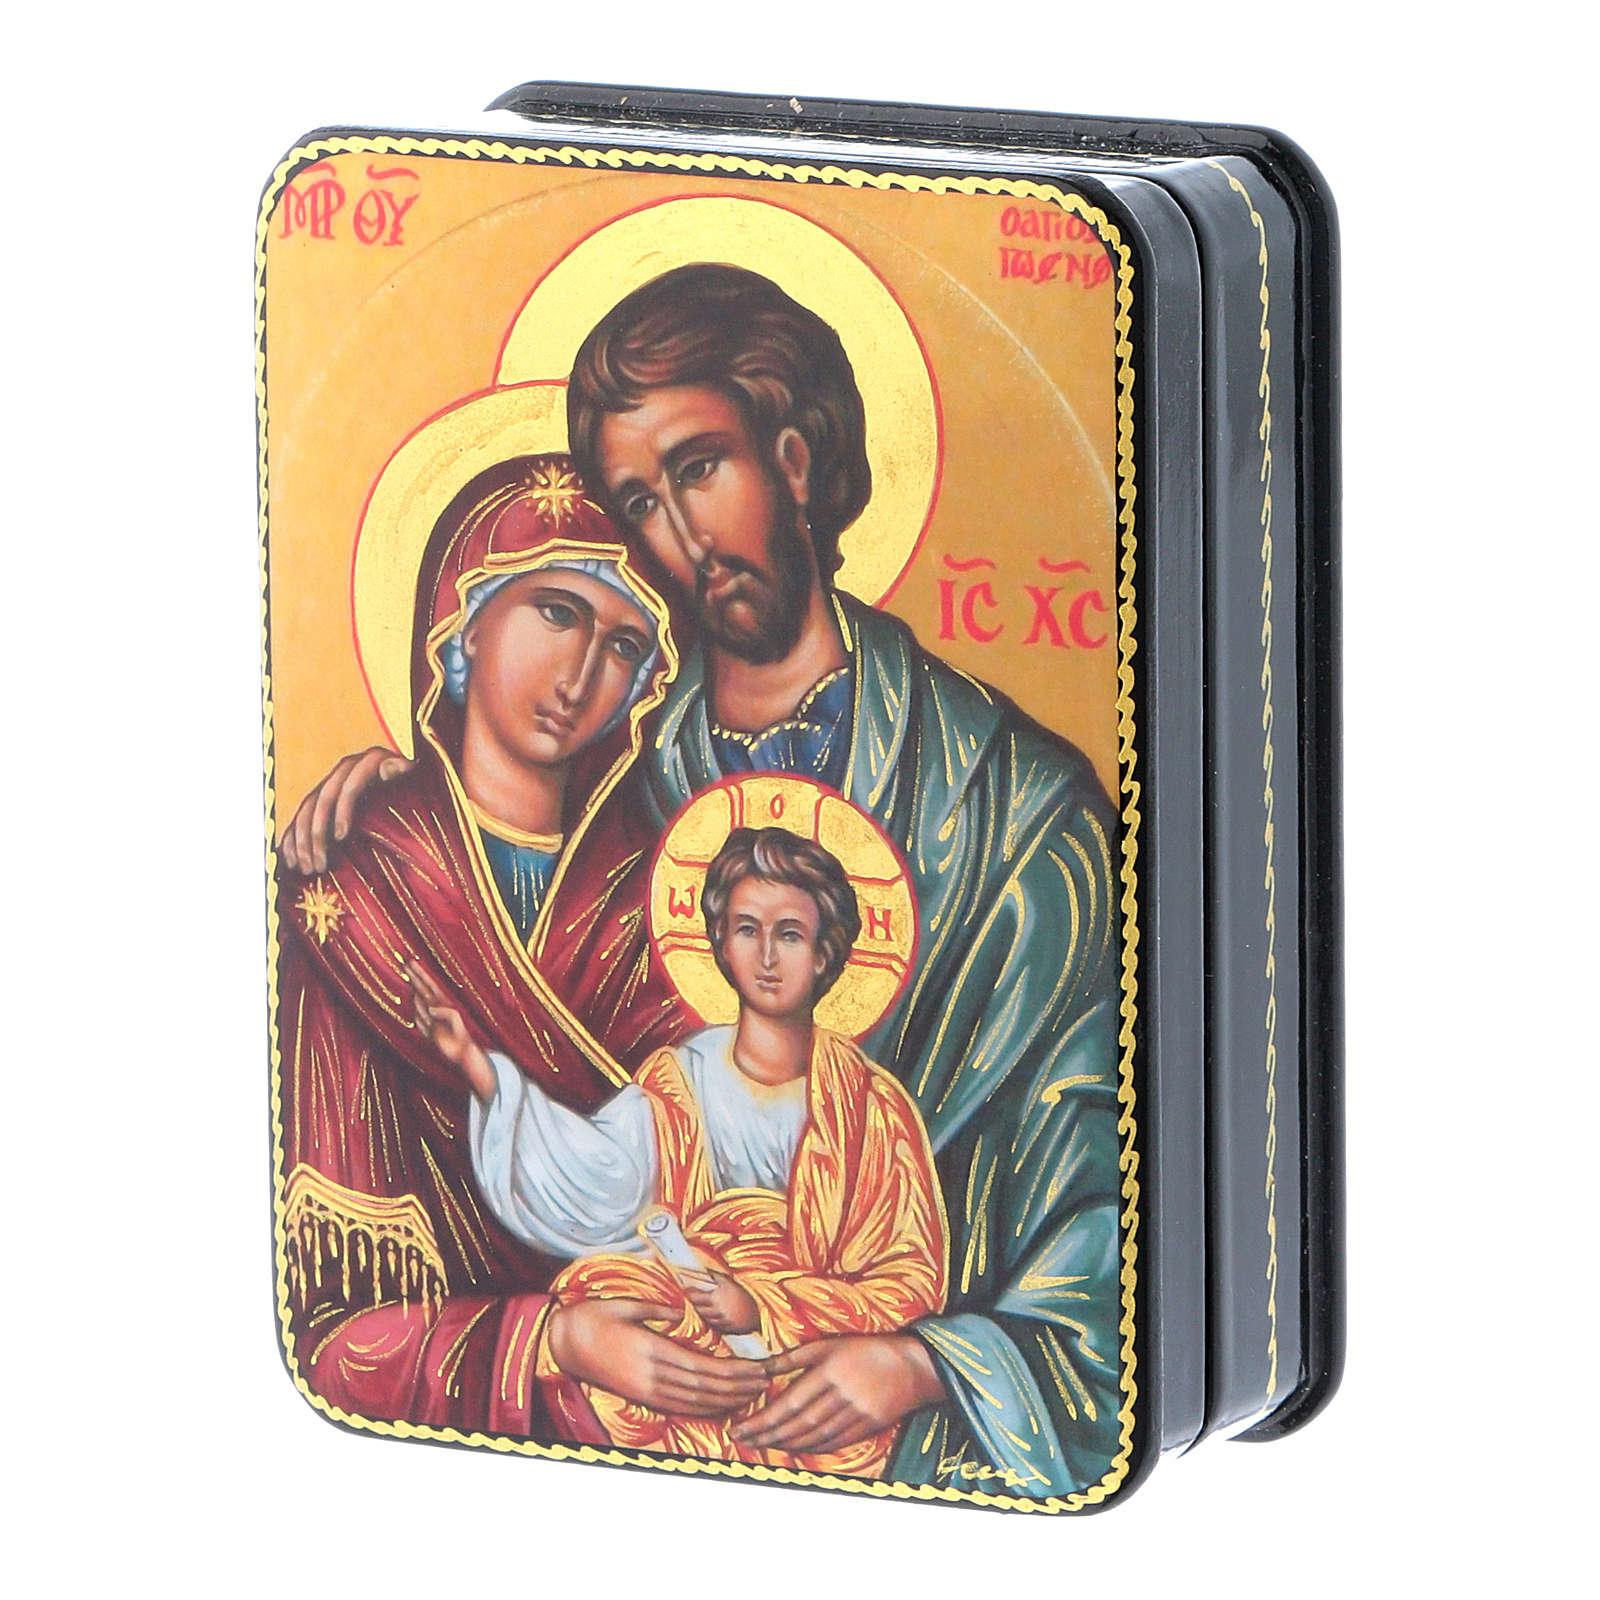 Scatola russa Papier-mâché Nascita Cristo Fedoskino style 11x8 4